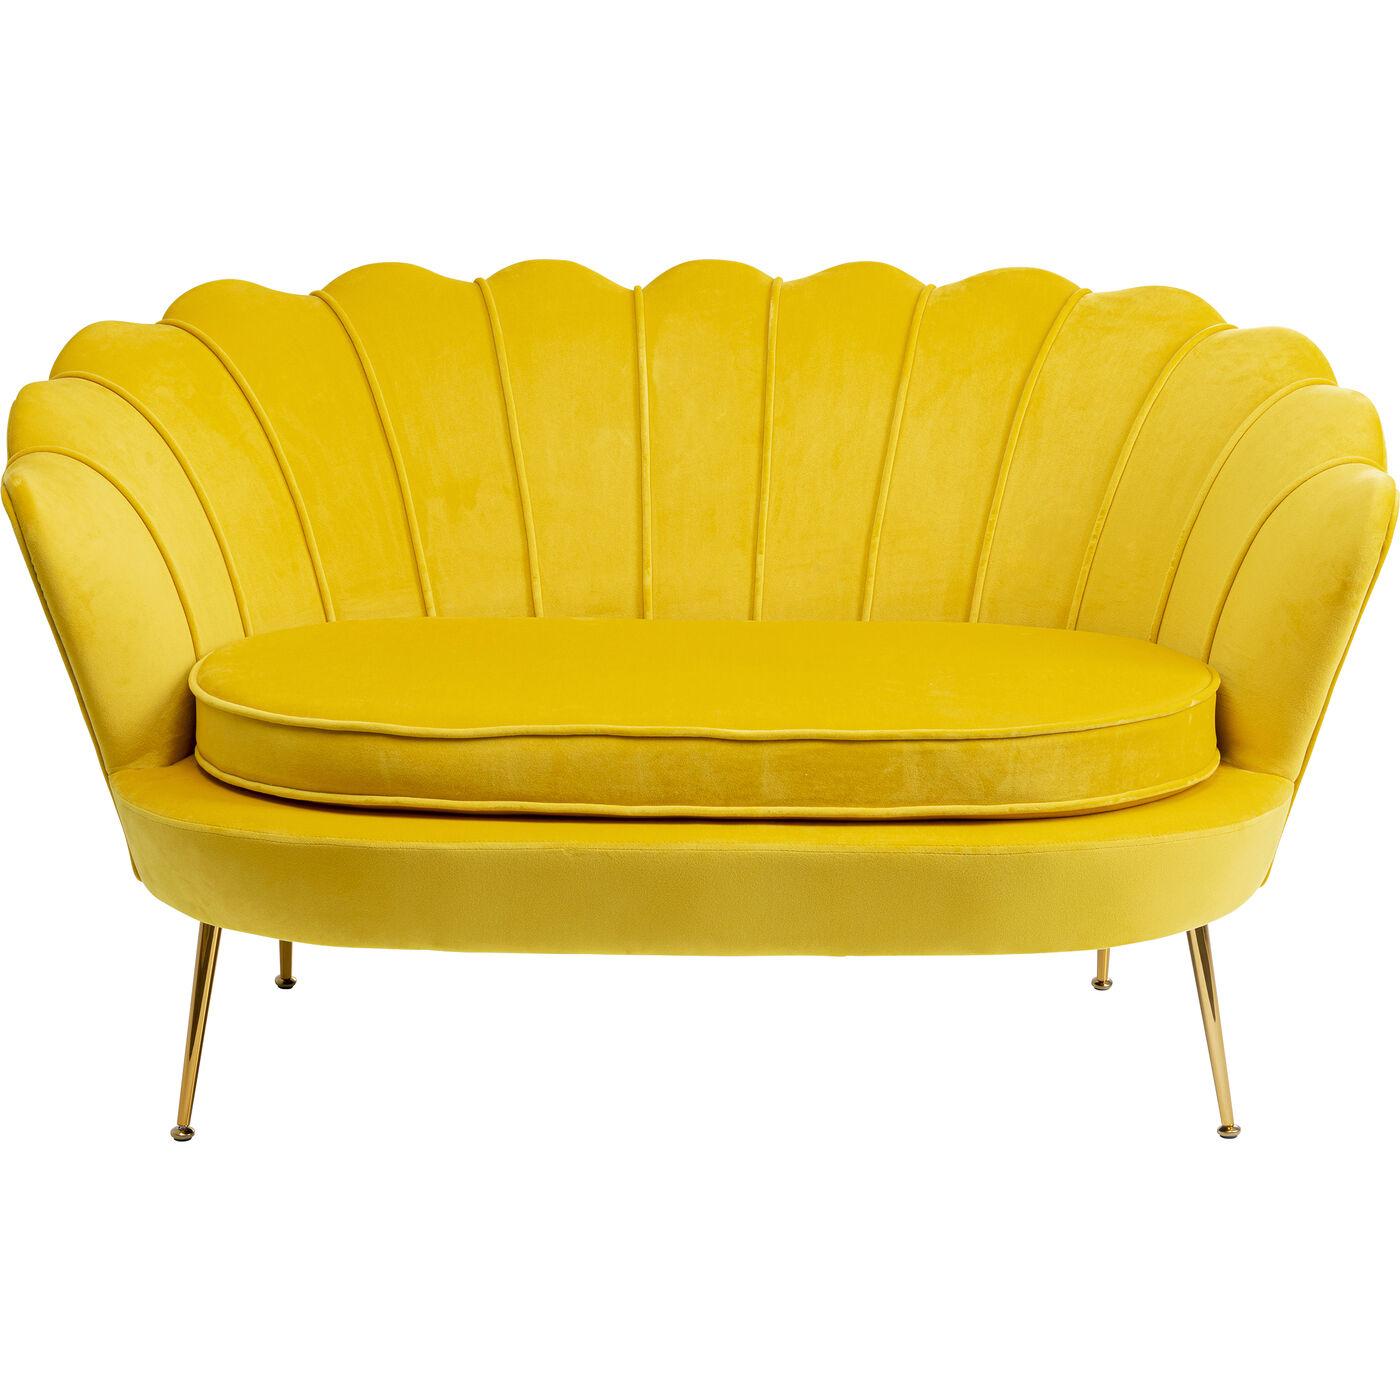 Sofa Water Lily 2-Sitzer Gelb 132cm